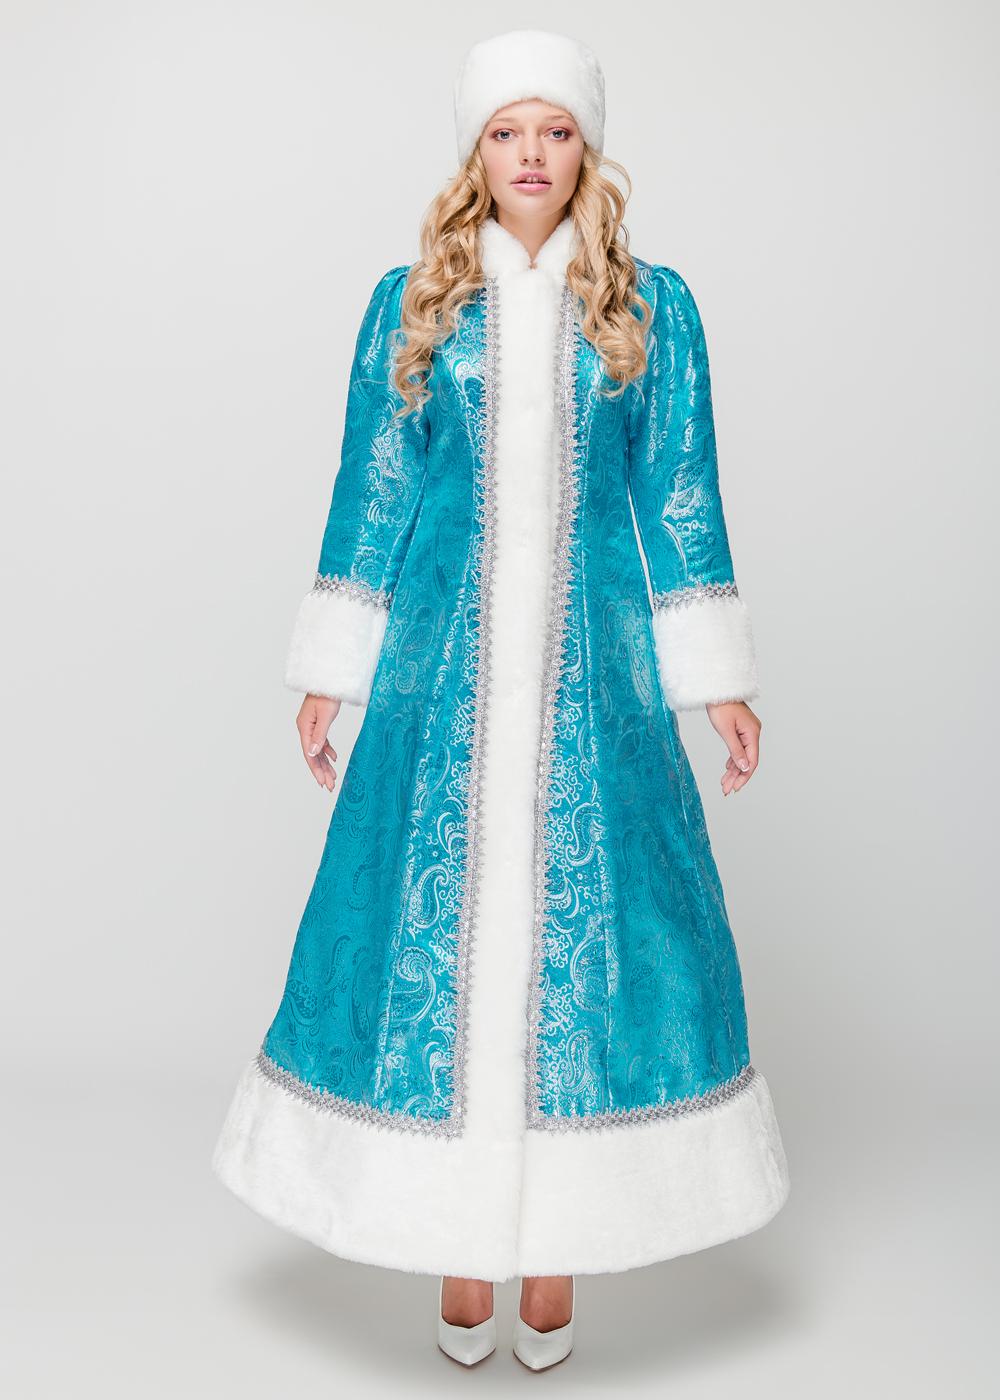 Костюм Снегурочки Атланта голубая